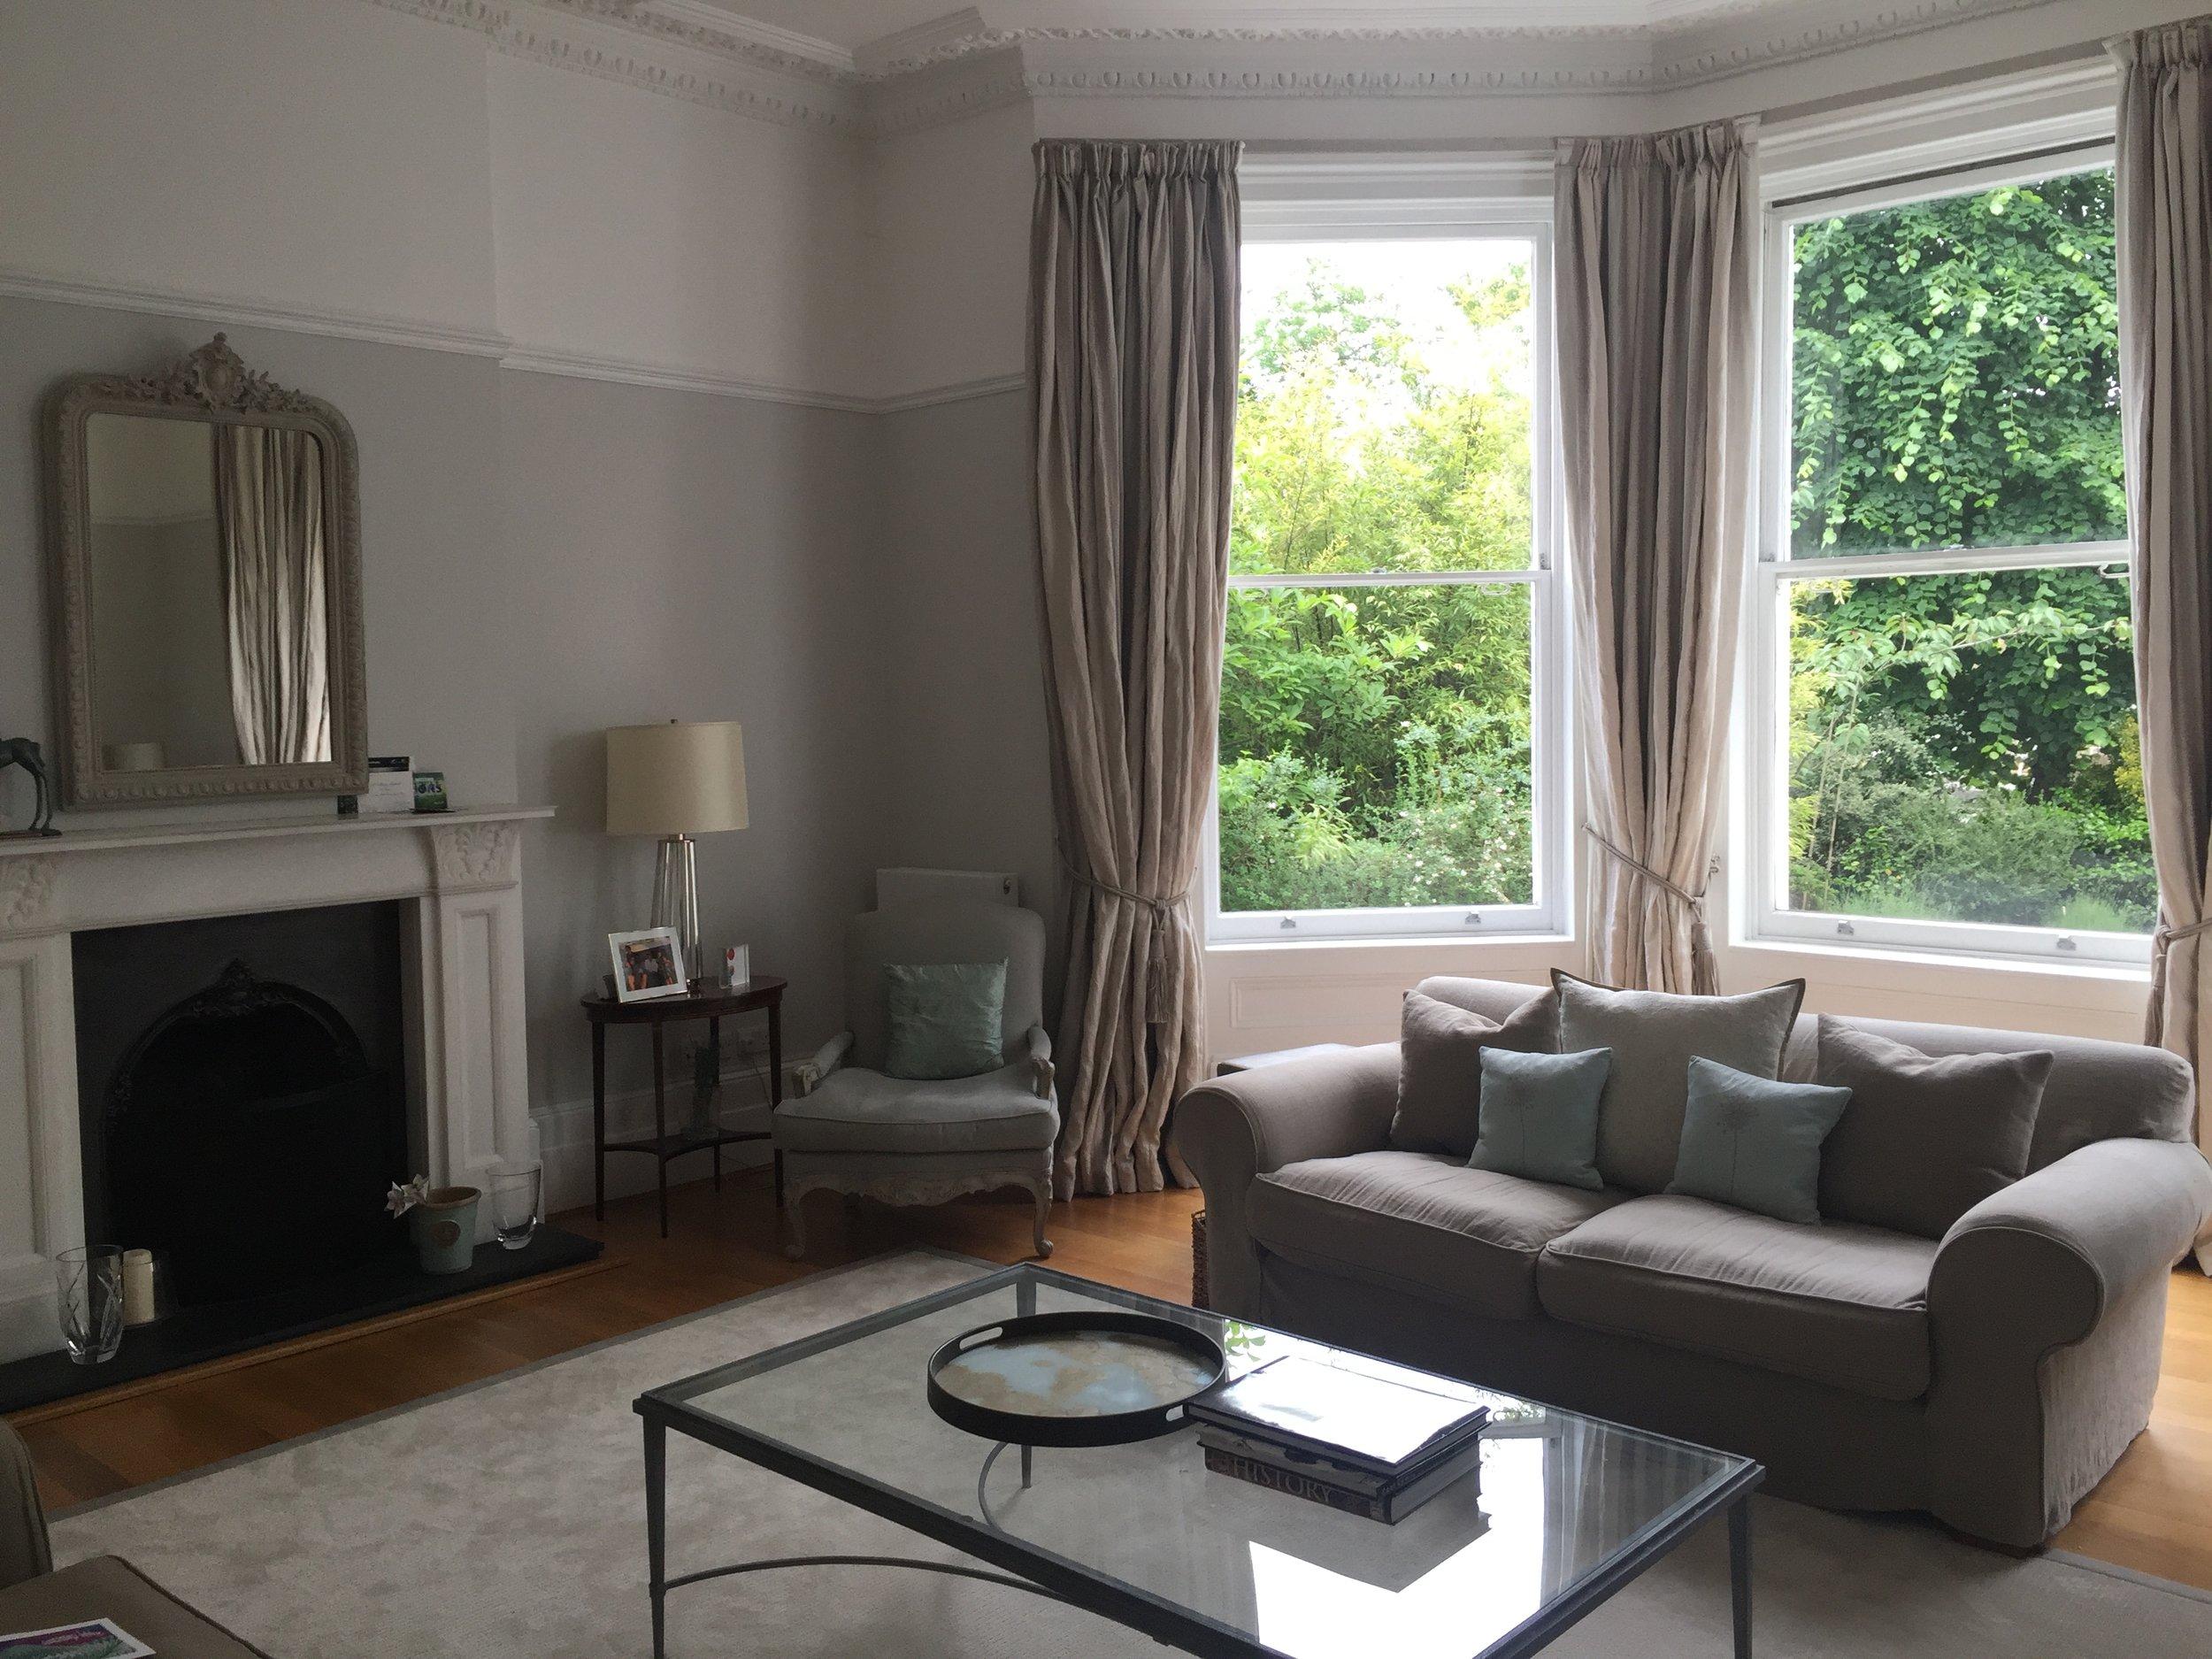 Cator Estate  interior design project: formal sitting room lighting design